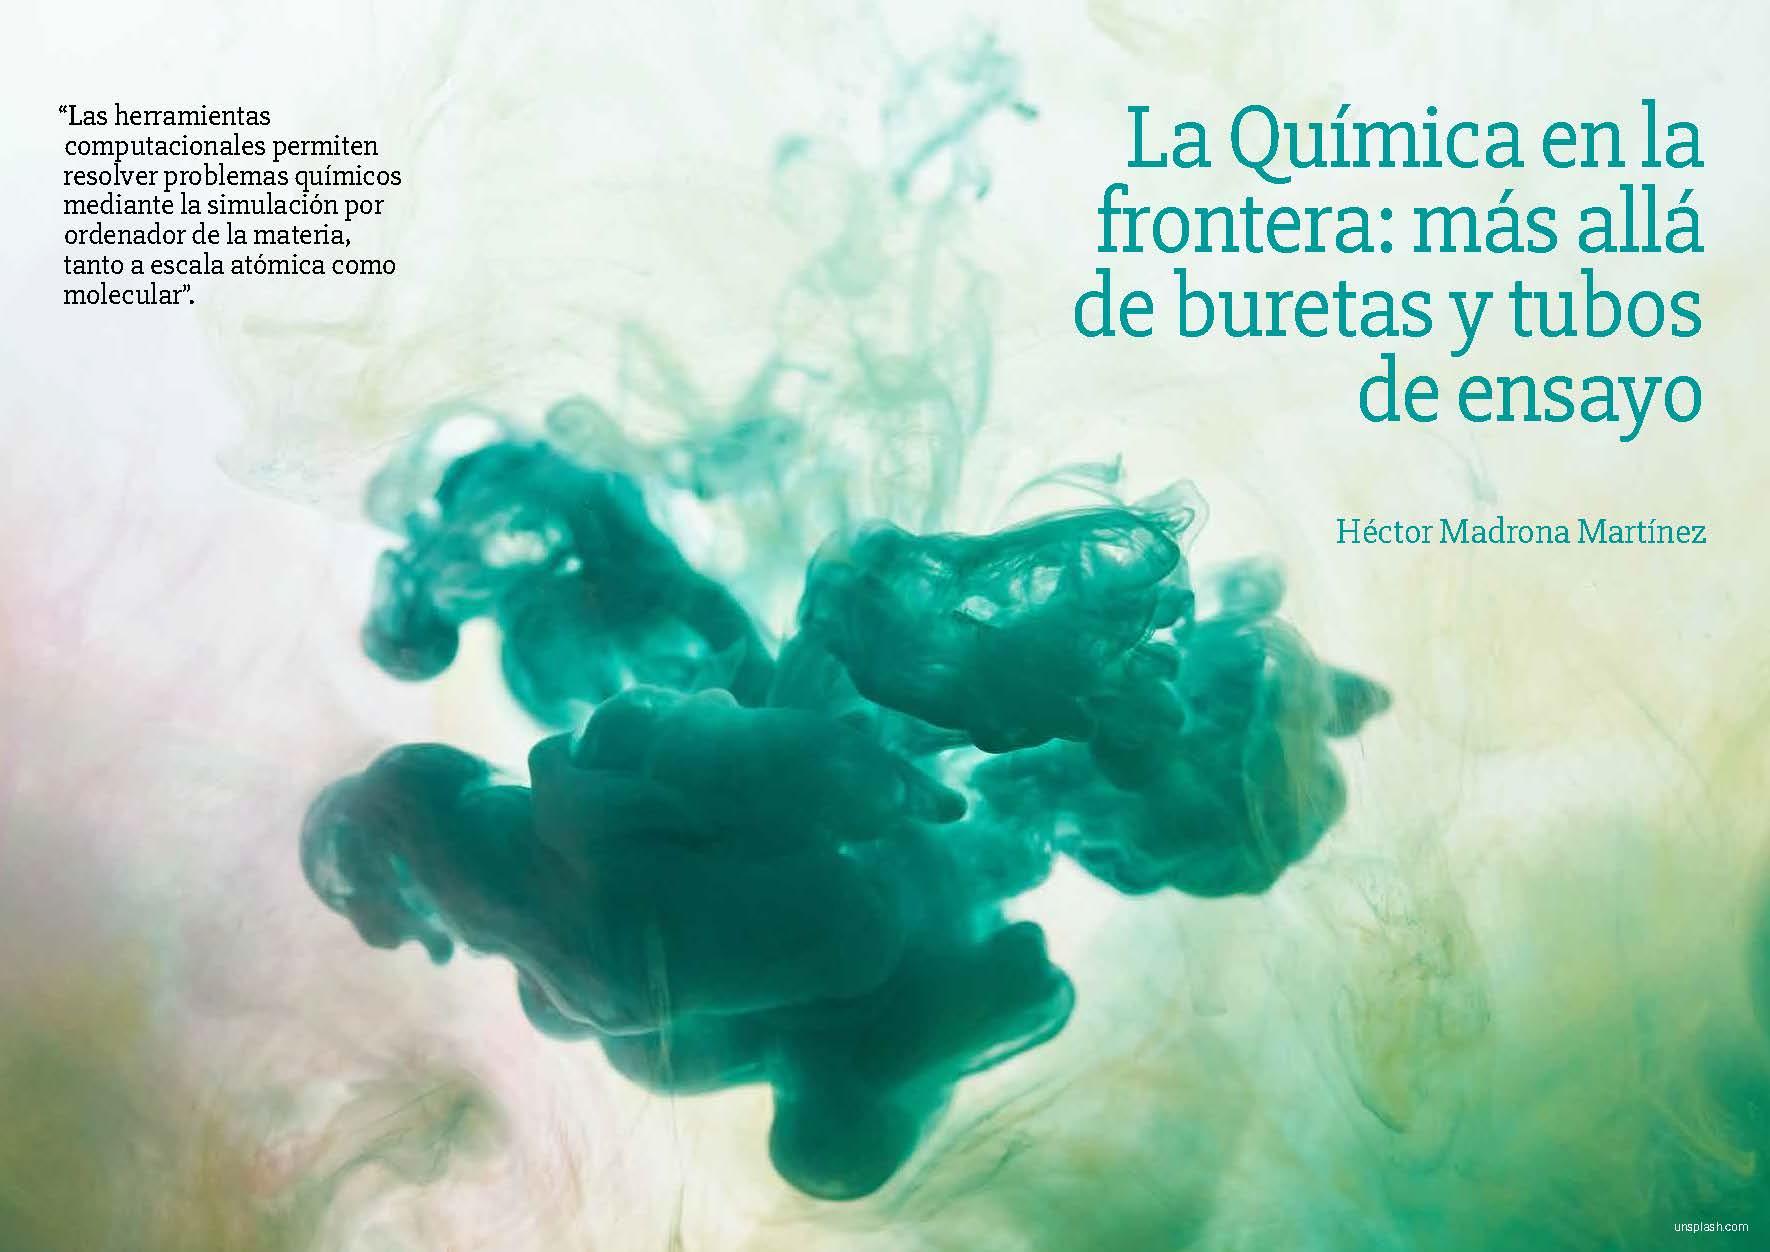 24_05_FronteraQuimica